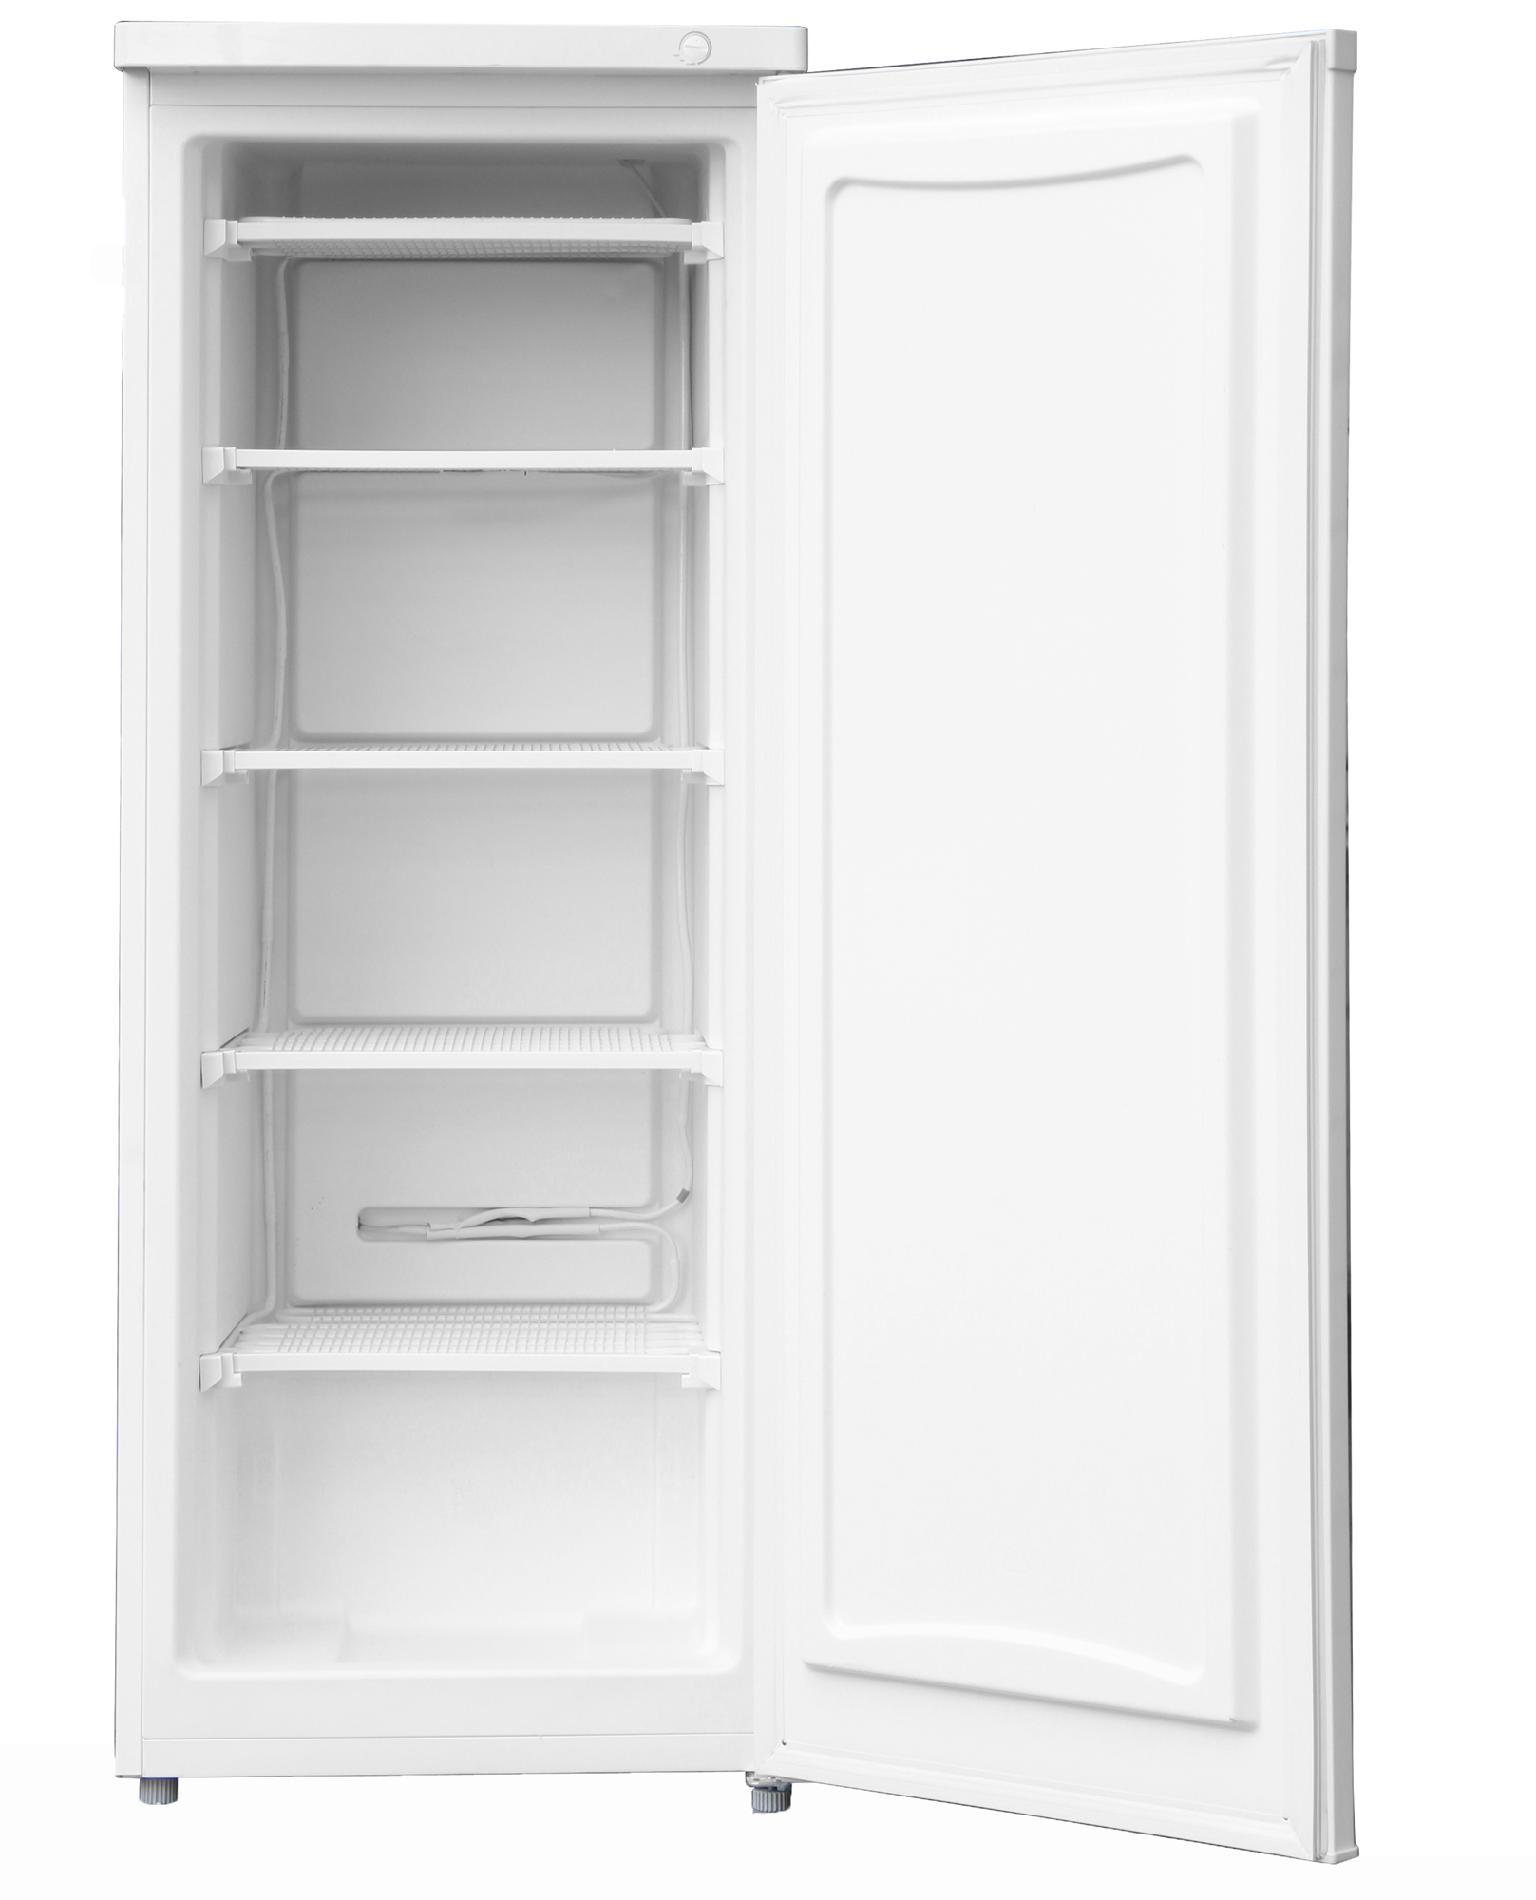 Kenmore 20602 5.8 cu. ft. Upright Freezer - White